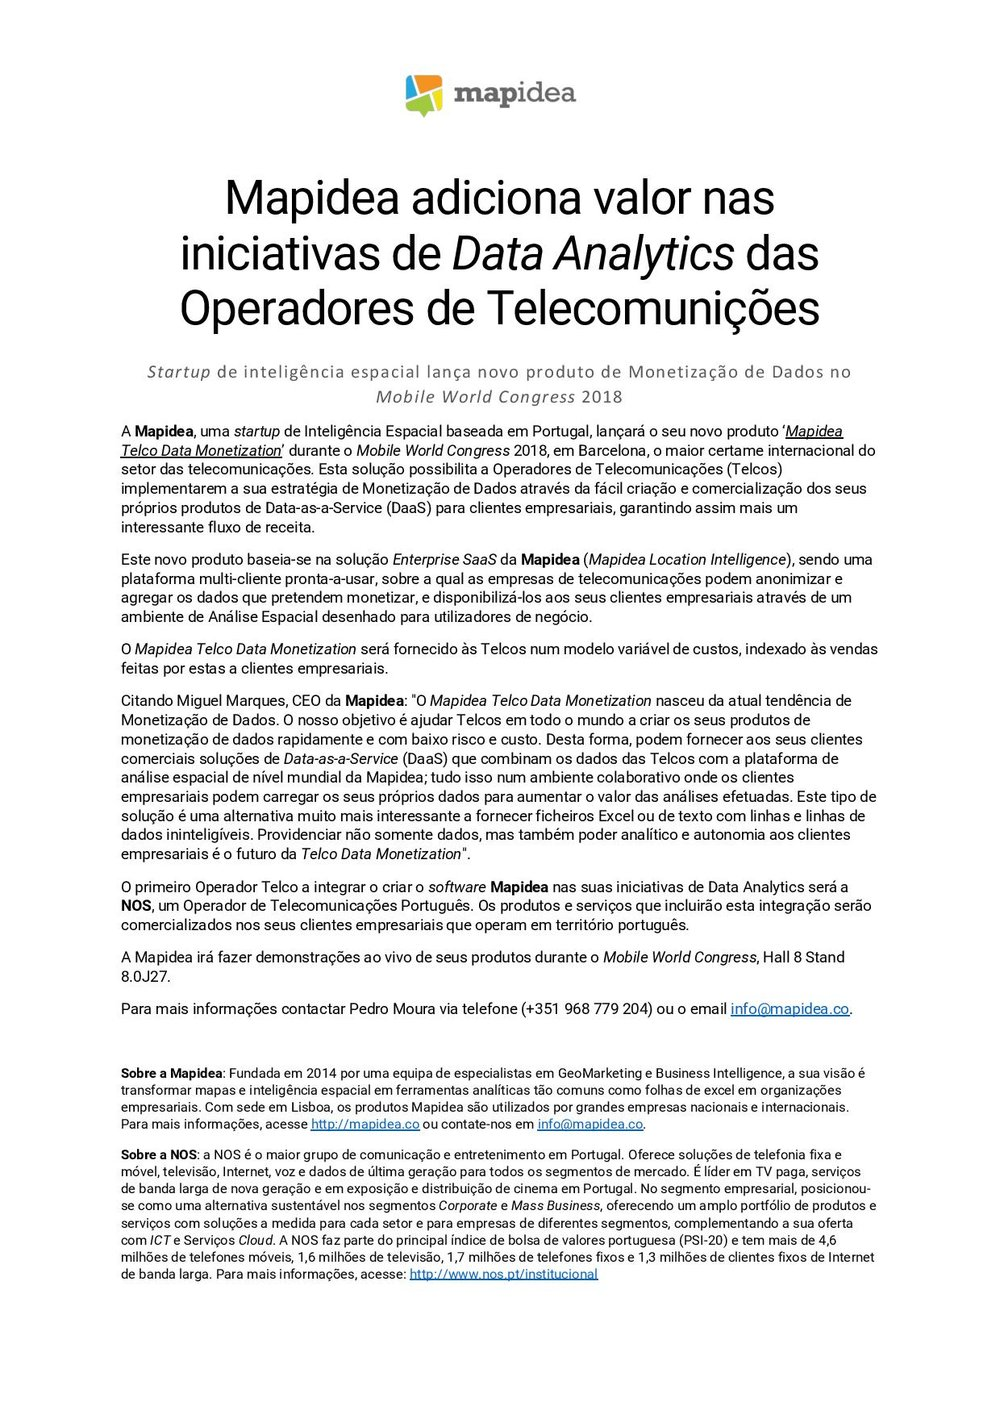 PR Mapidea Data Monetization - MWC2018_with NOS_Update_PT-page-001.jpg